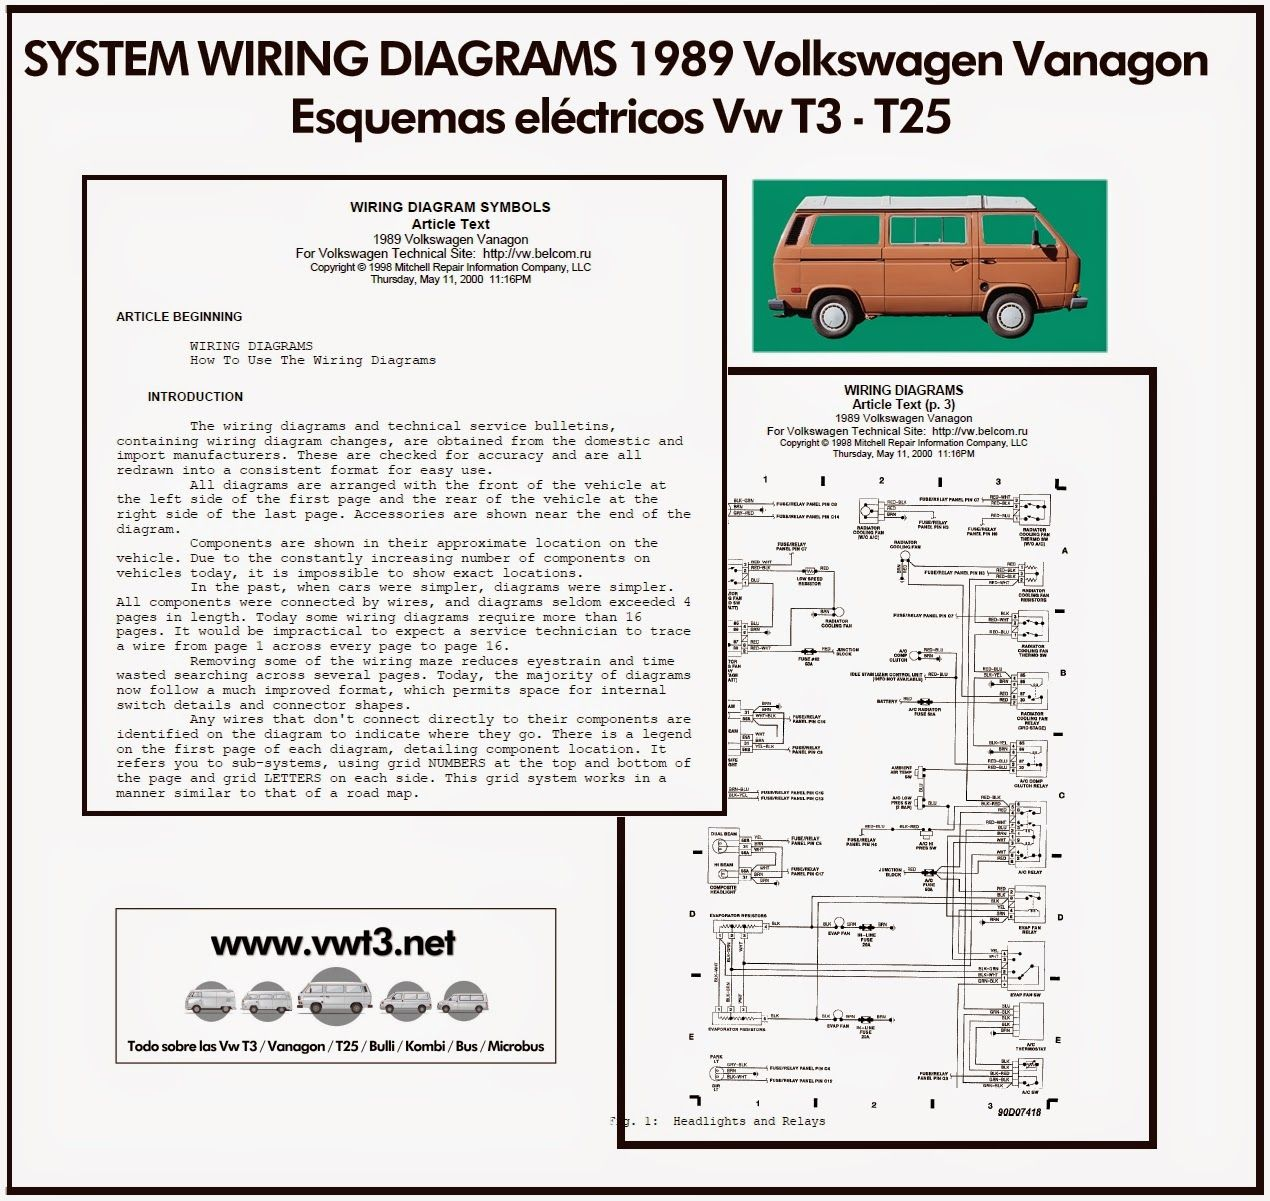 wiring diagrams for headlights on 1990 vw westfalia wiring library volkswagen t3 vw t25 vanagon bulli [ 1270 x 1201 Pixel ]